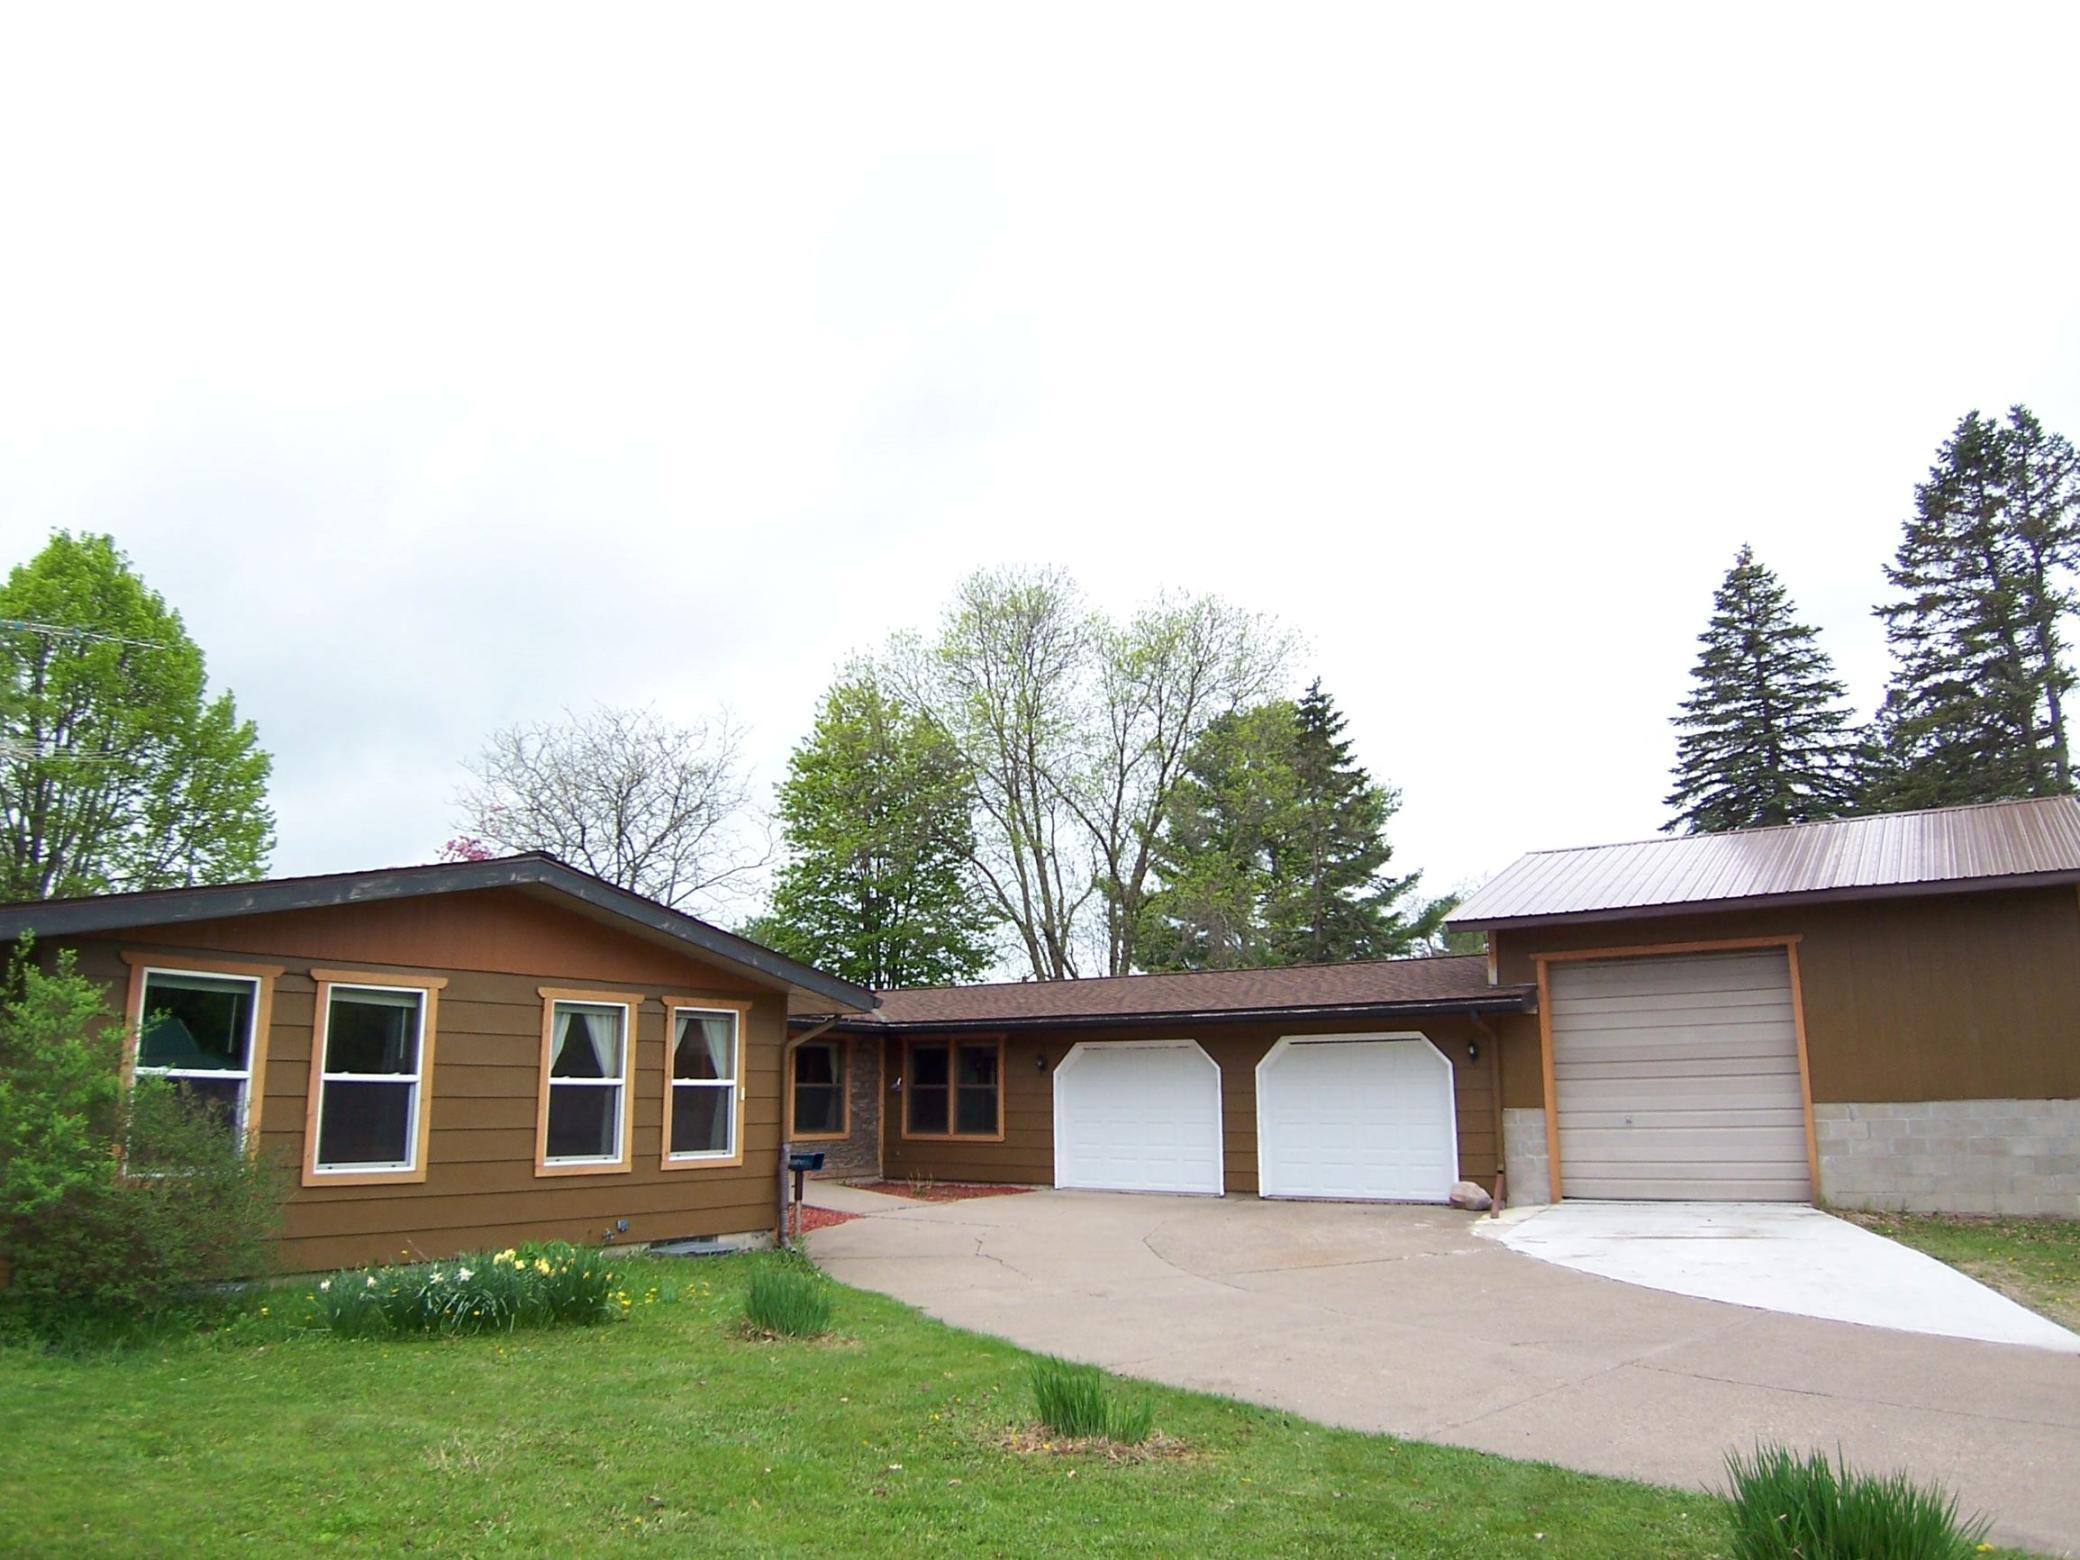 7355 Fir E Property Photo - Webster, WI real estate listing